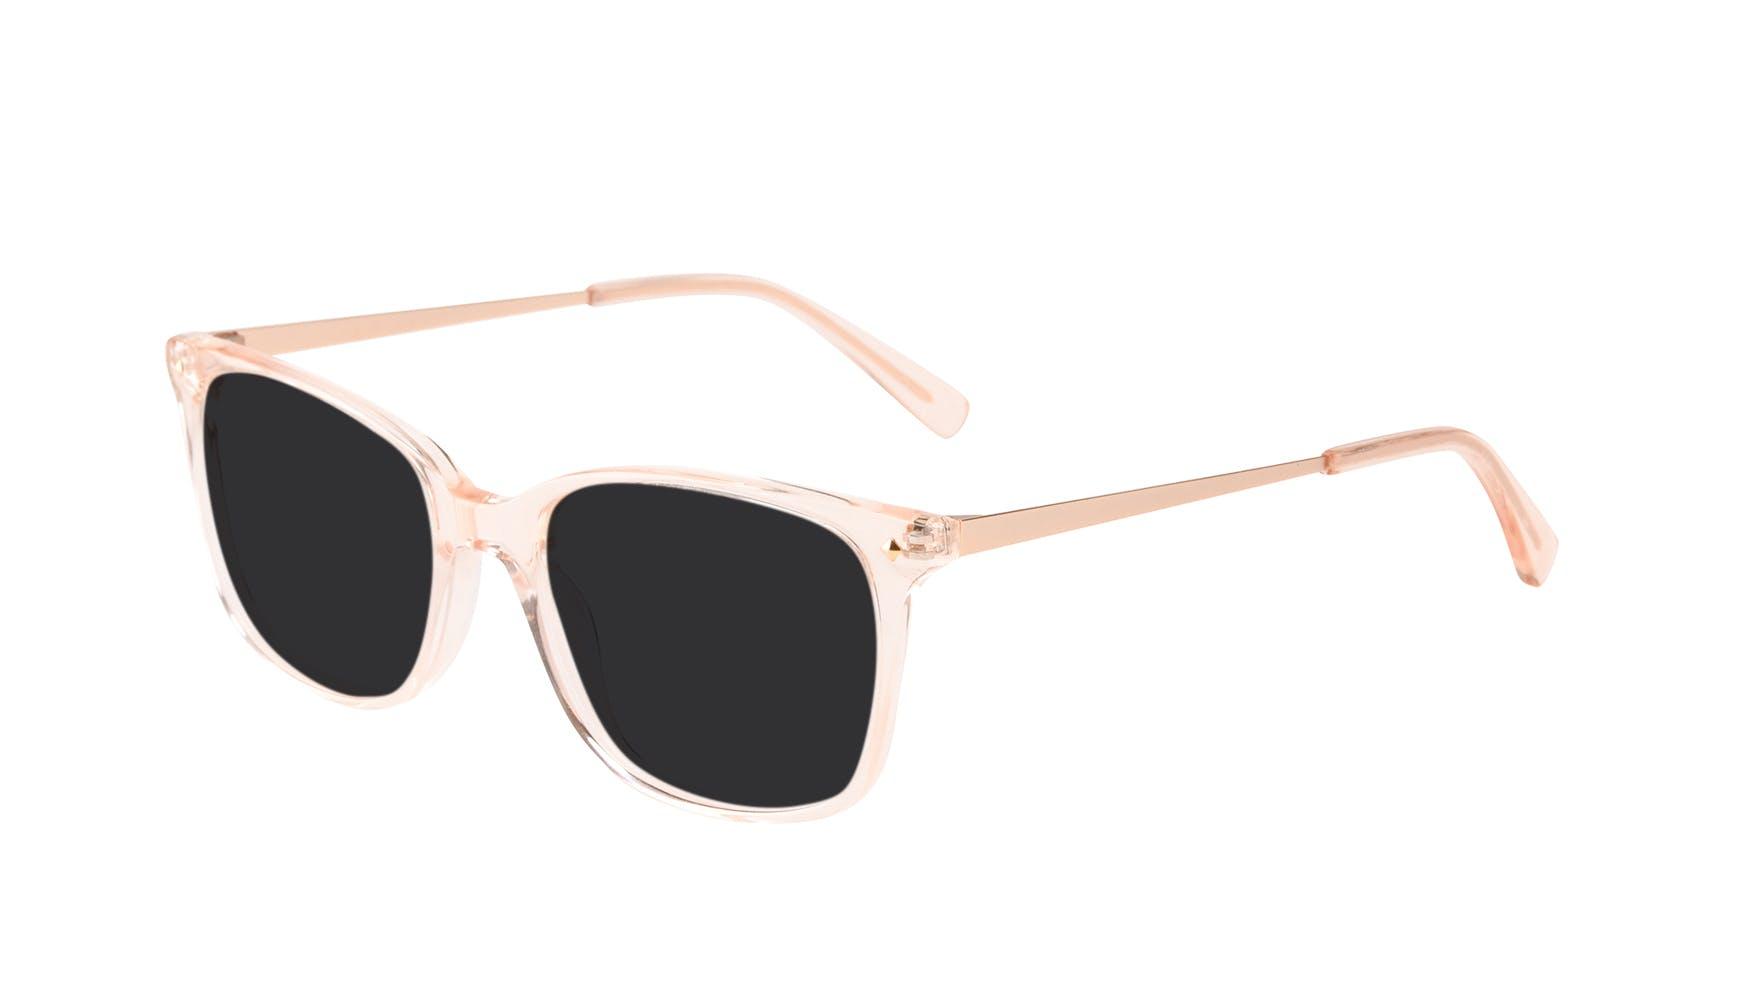 Affordable Fashion Glasses Rectangle Square Sunglasses Women Refine Blond Tilt